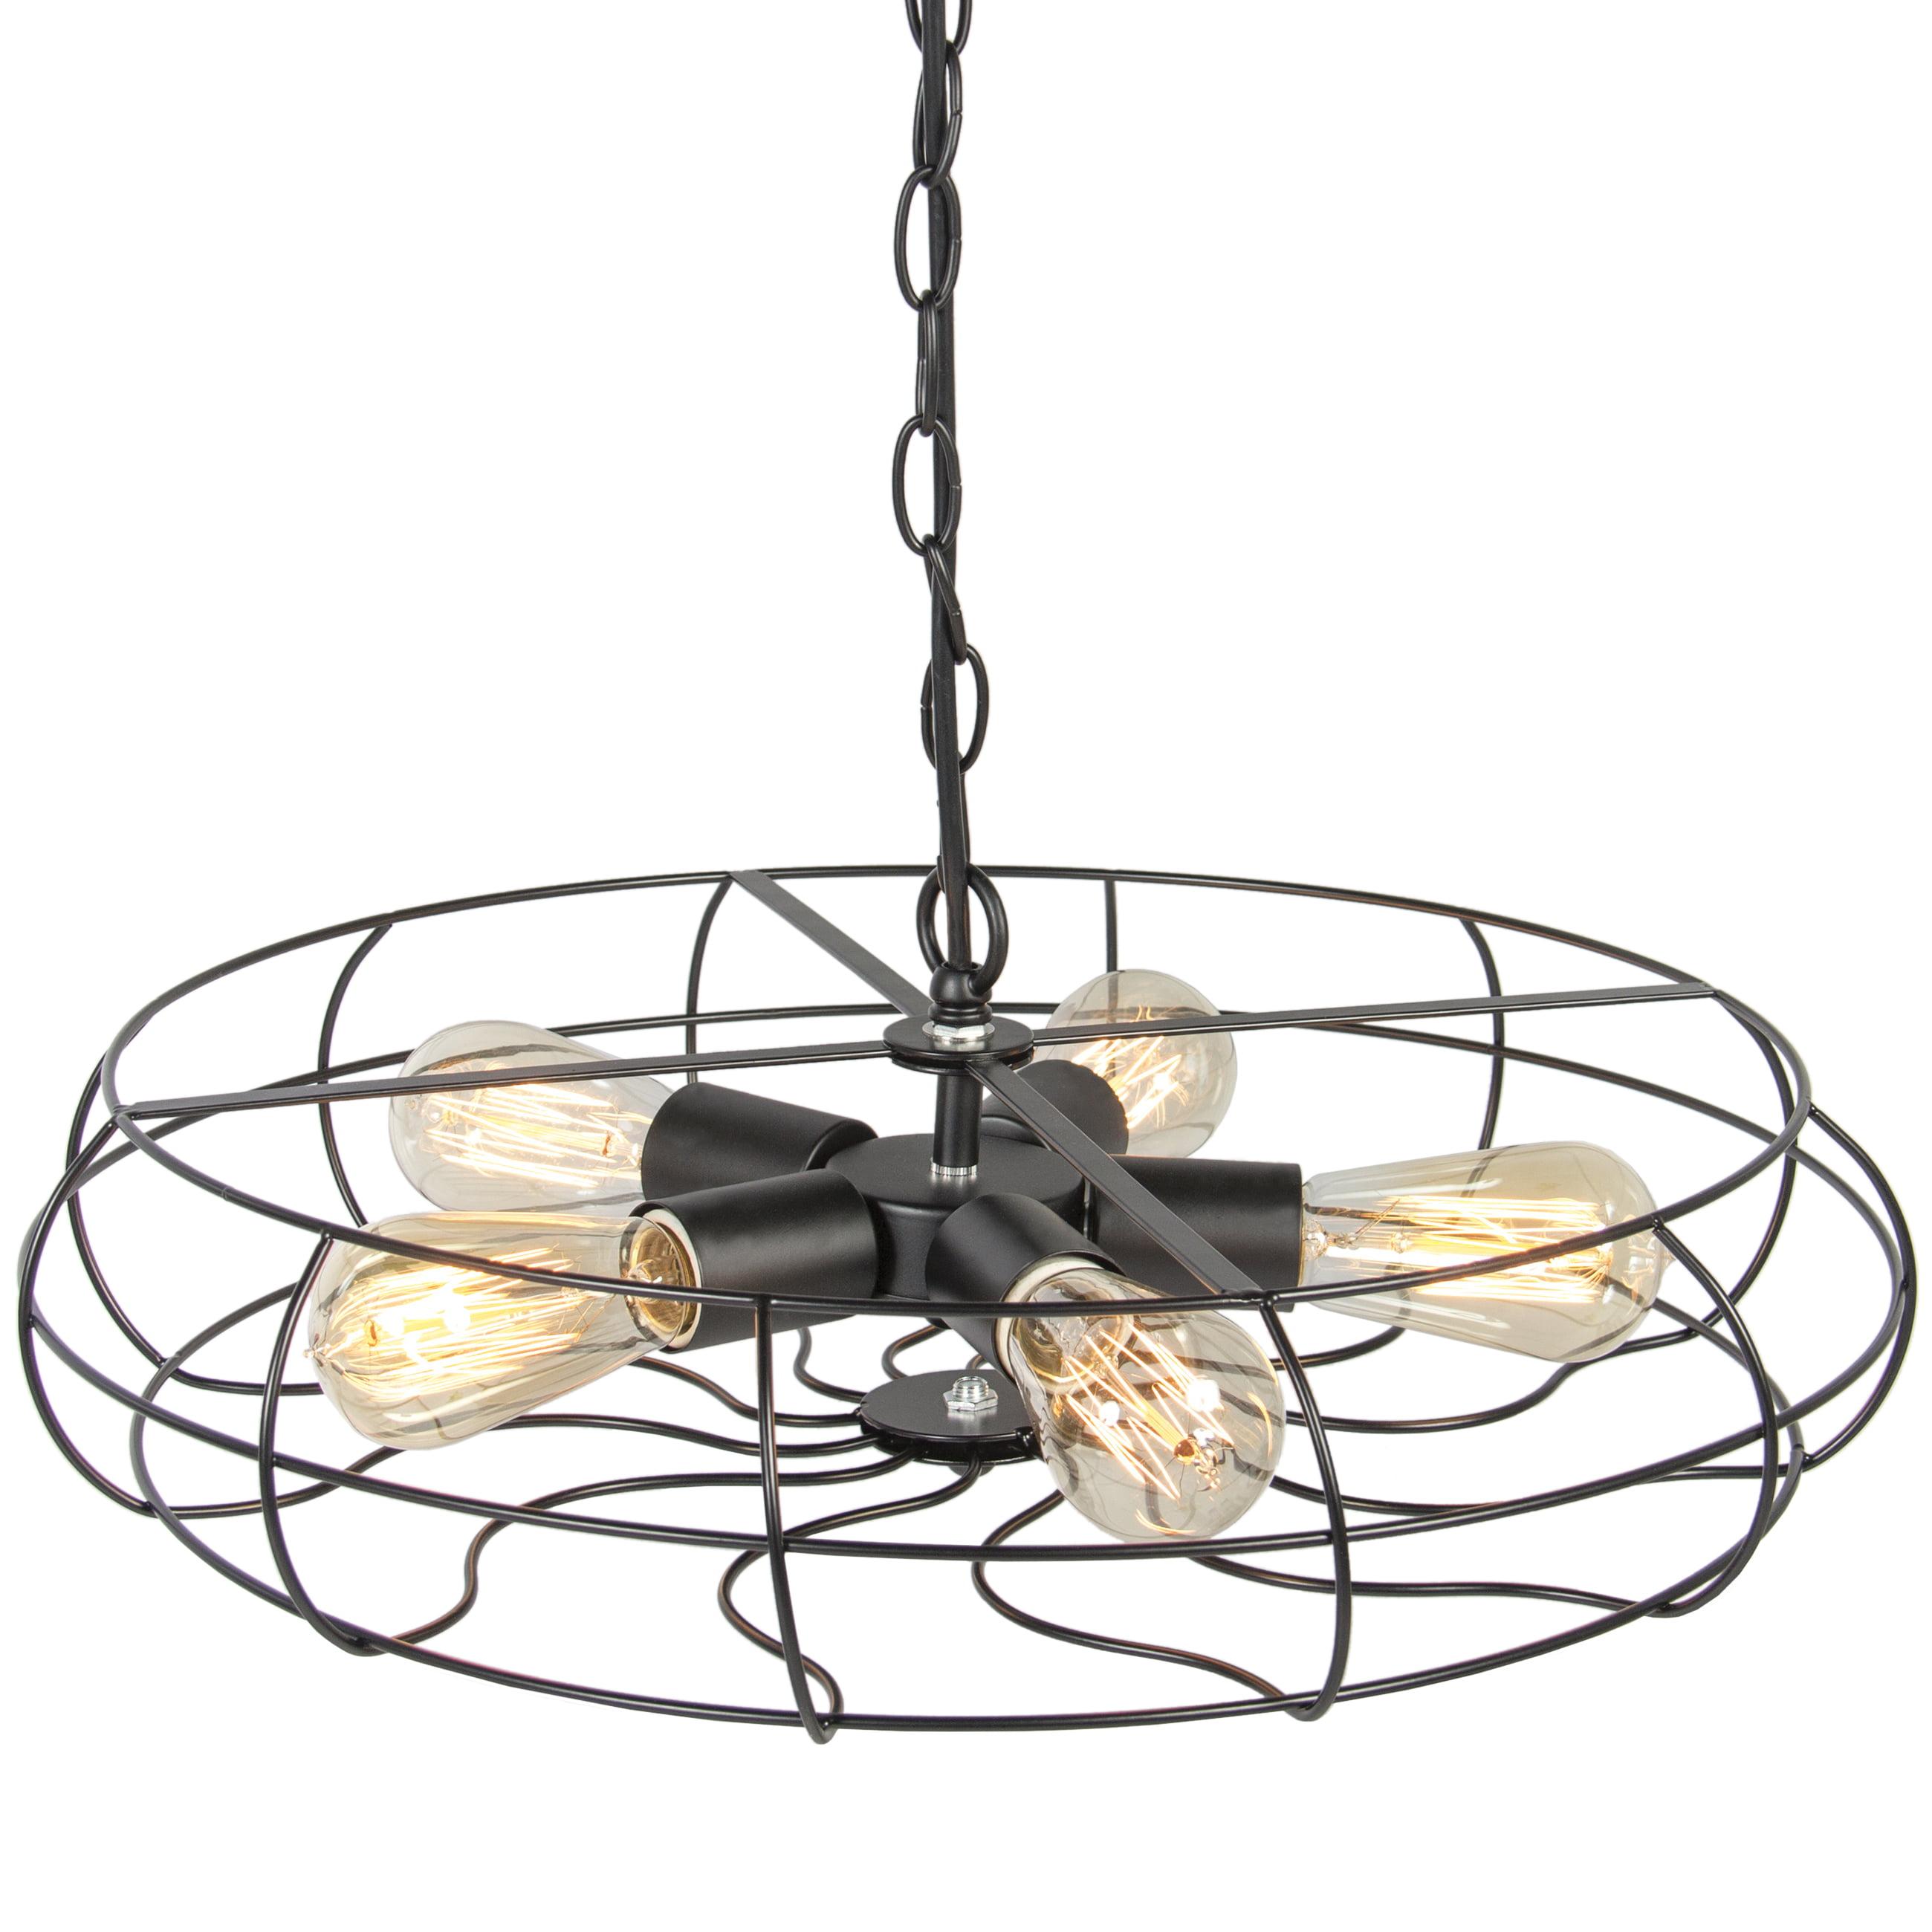 Best Choice Products Industrial Vintage Metal Hanging Ceiling Chandelier Lighting W 5 Lights Black Walmart Com Walmart Com